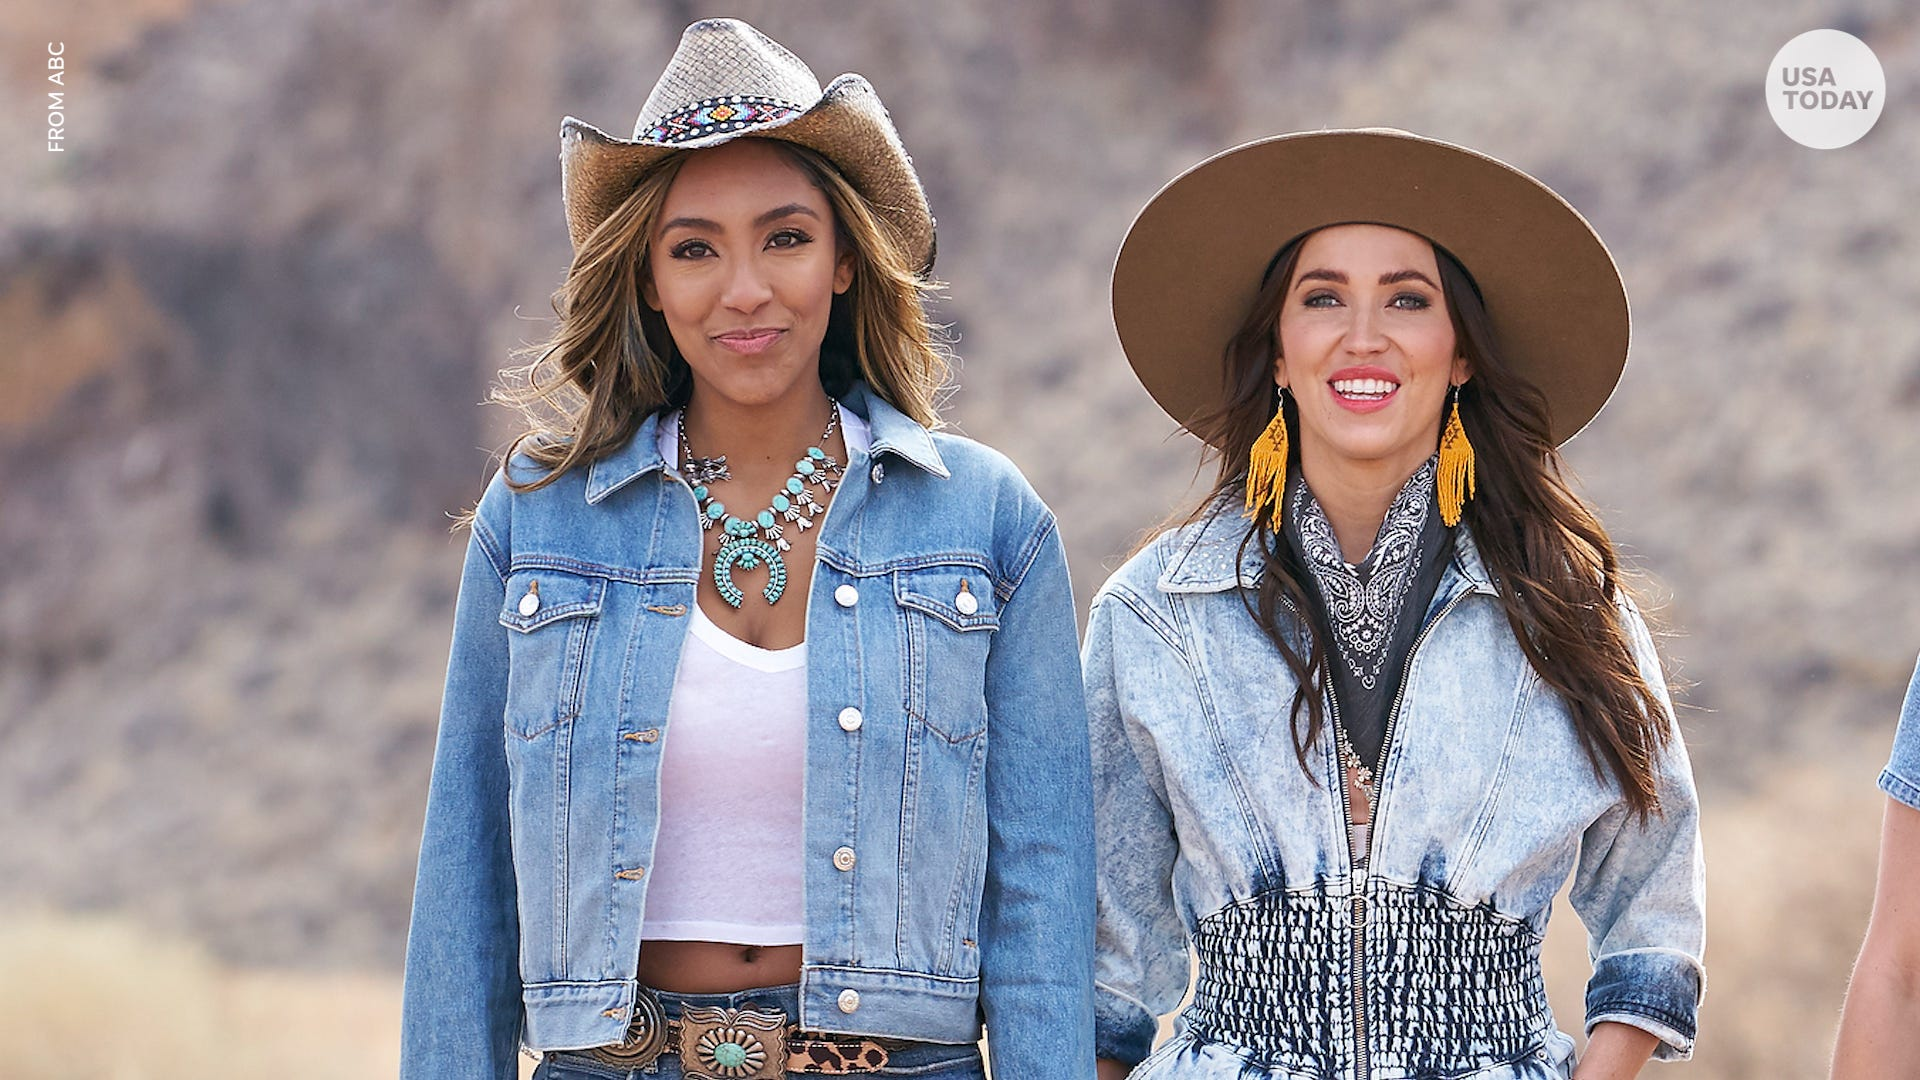 'Bachelorette' hosts Kaitlyn Bristowe and Tayshia Adams consider Chris Harrison a 'friend'